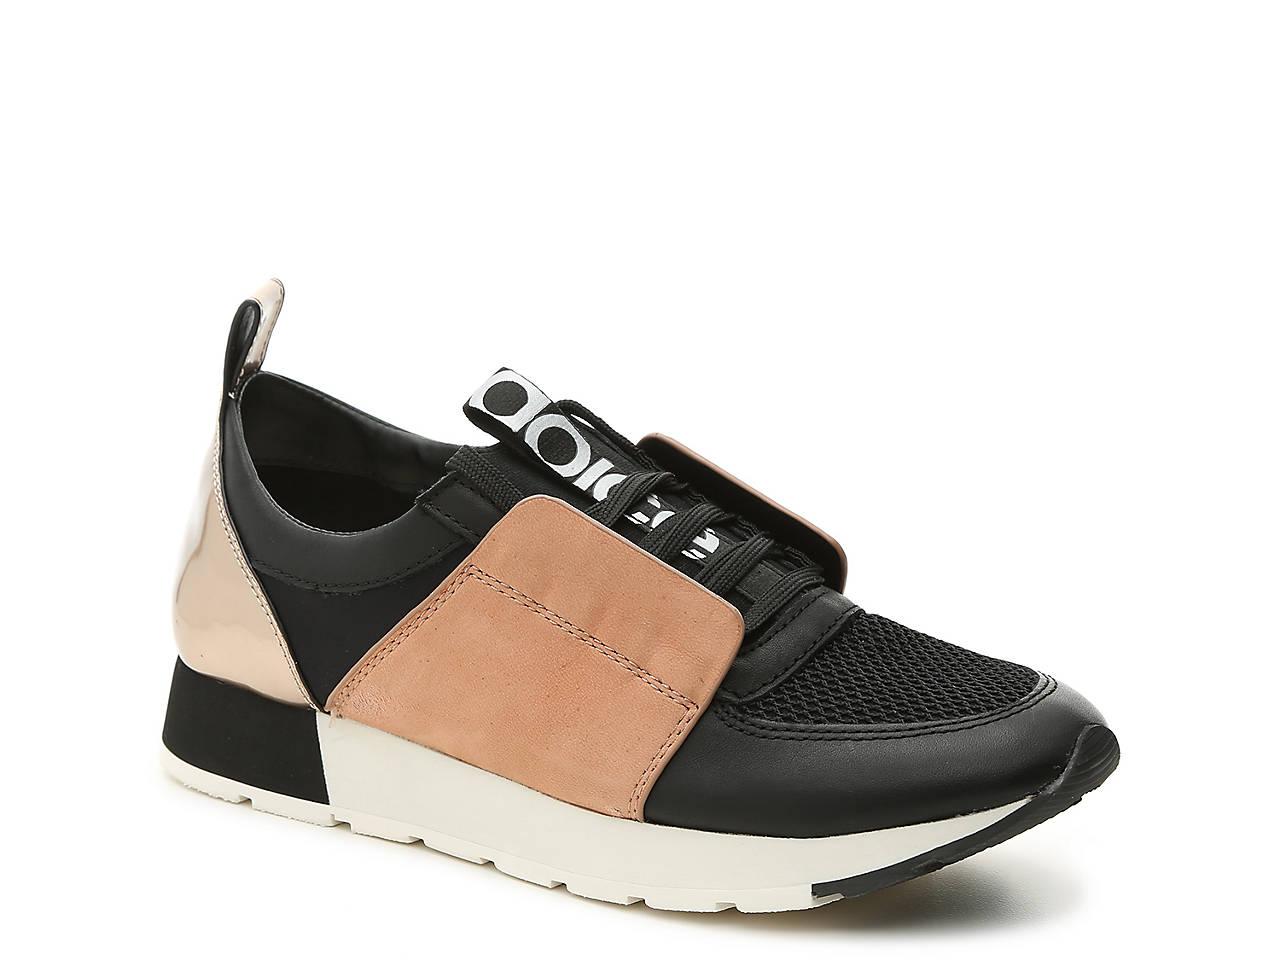 5134681797c Dolce Vita Yana Sneaker Men s Shoes